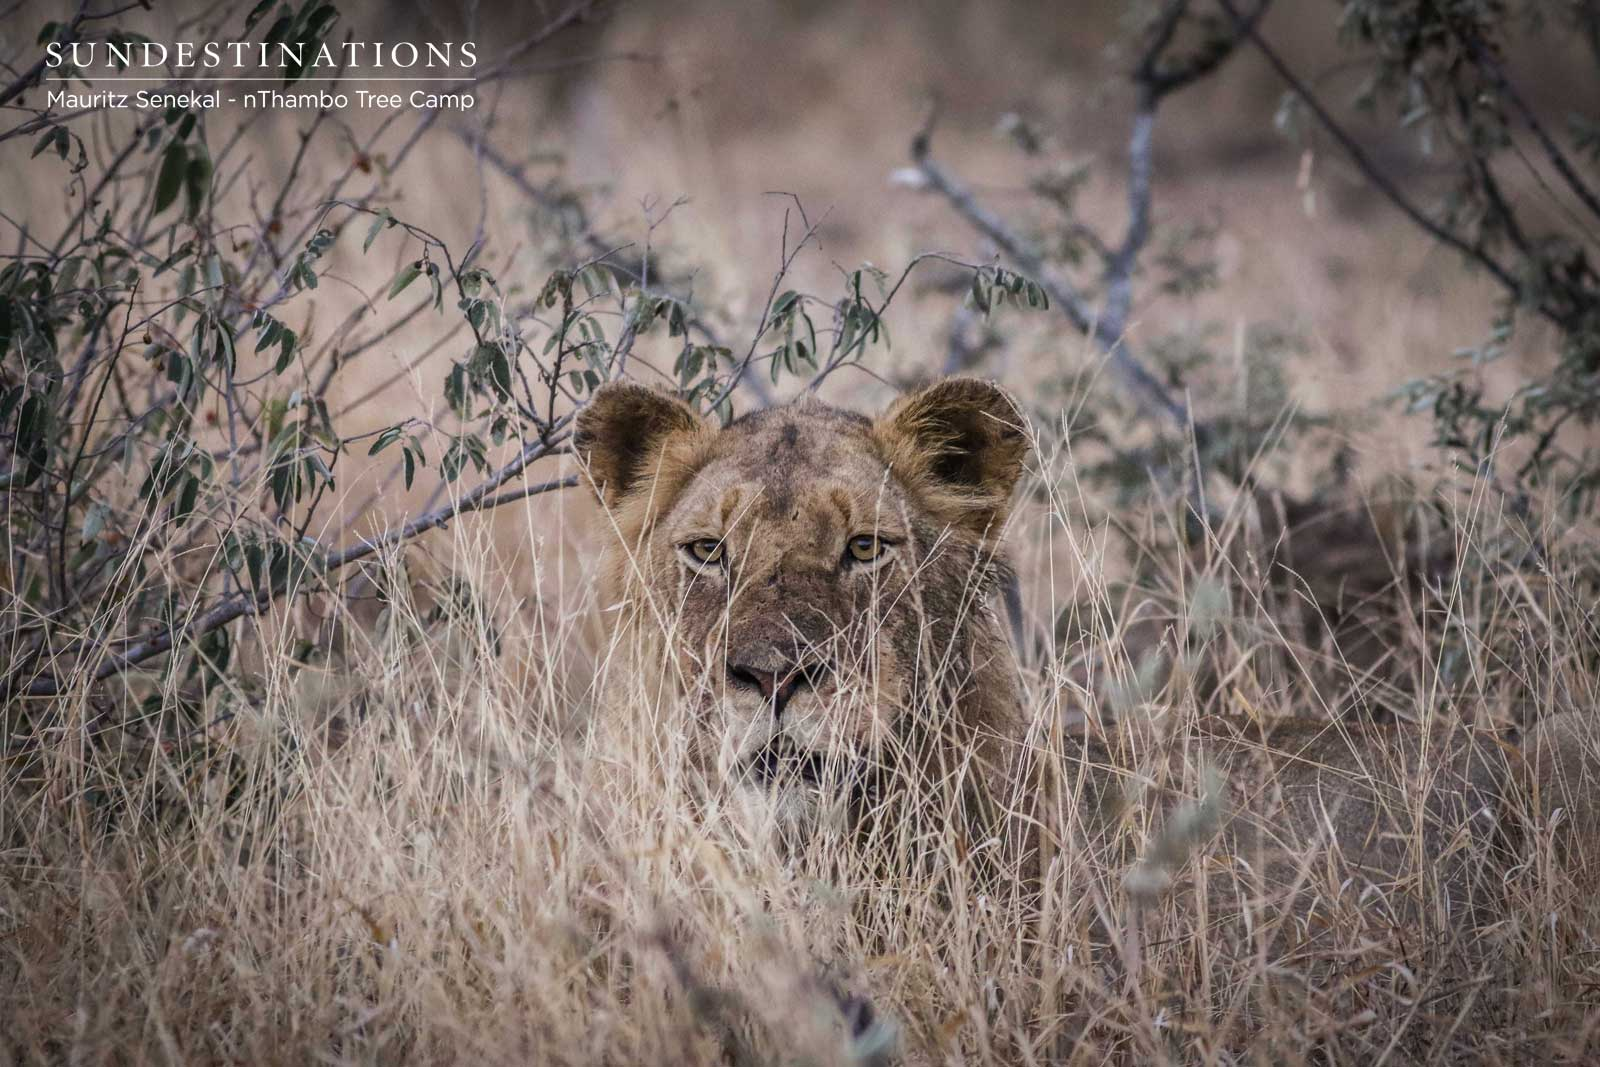 Skittish Lions Feast on Giraffe Kill for Days